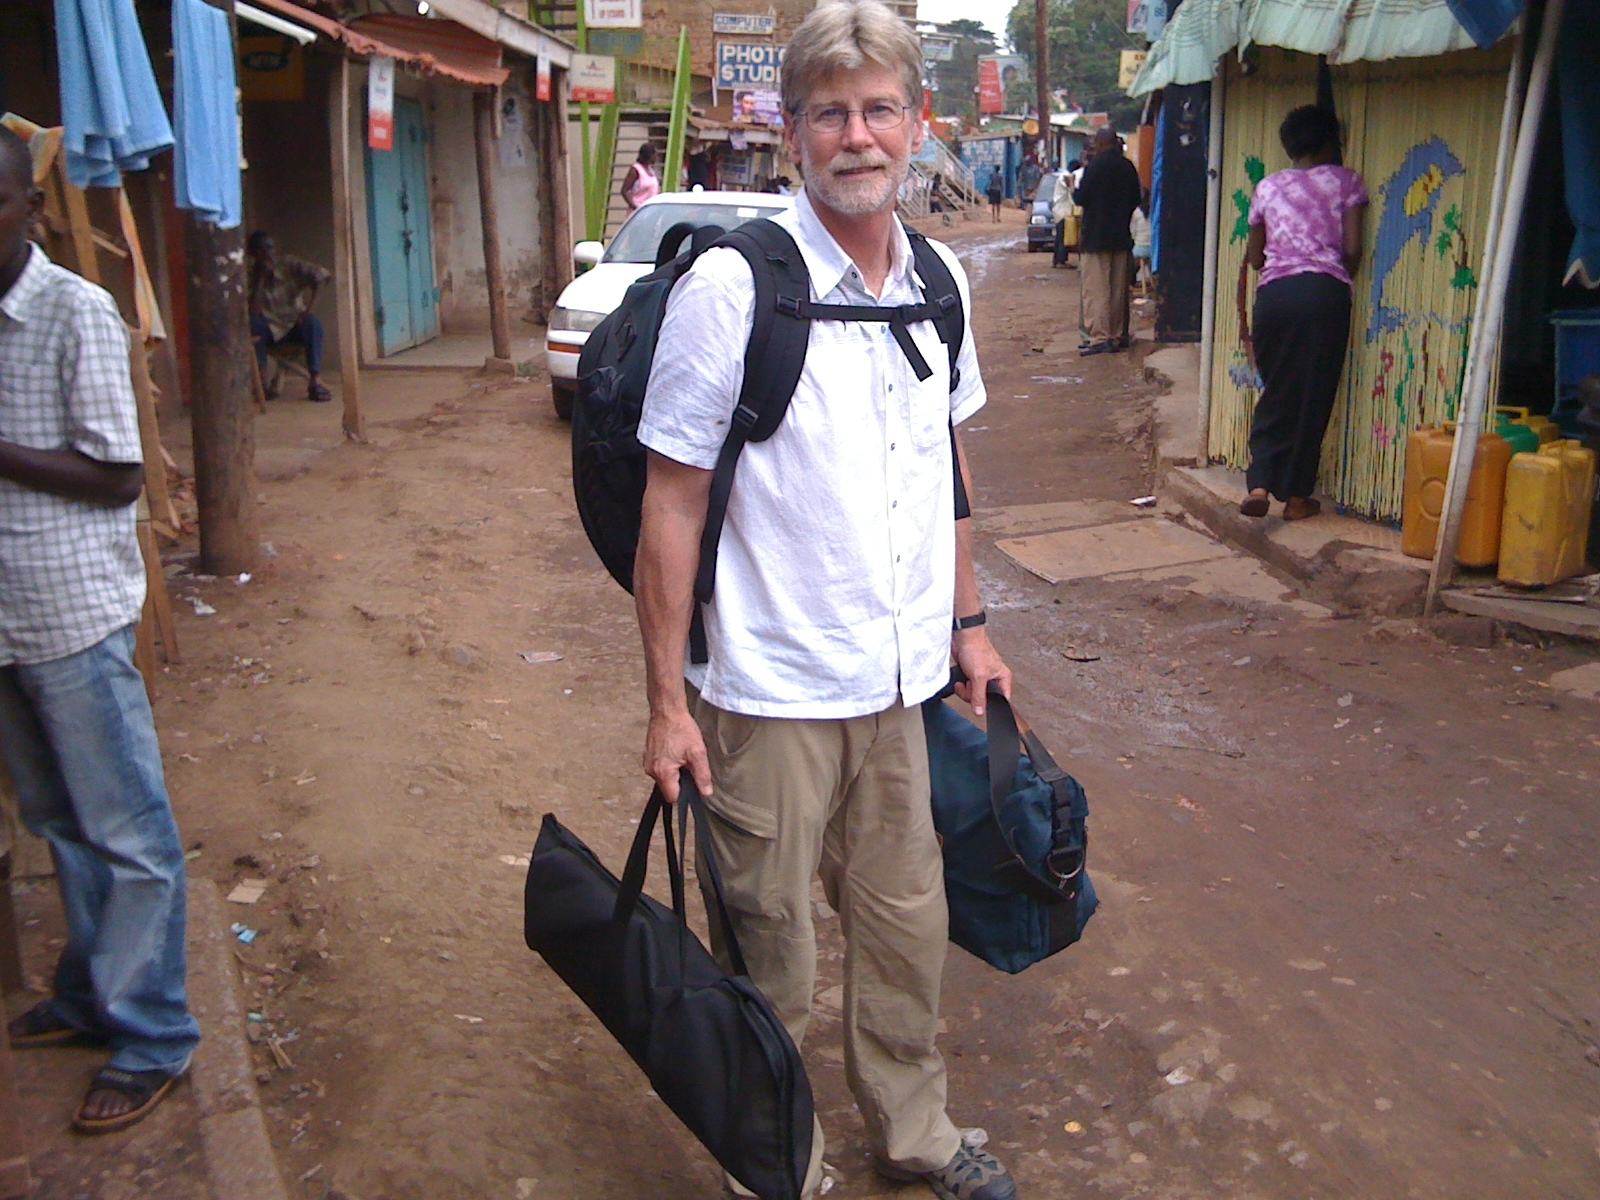 Filming in Kampala, Uganda